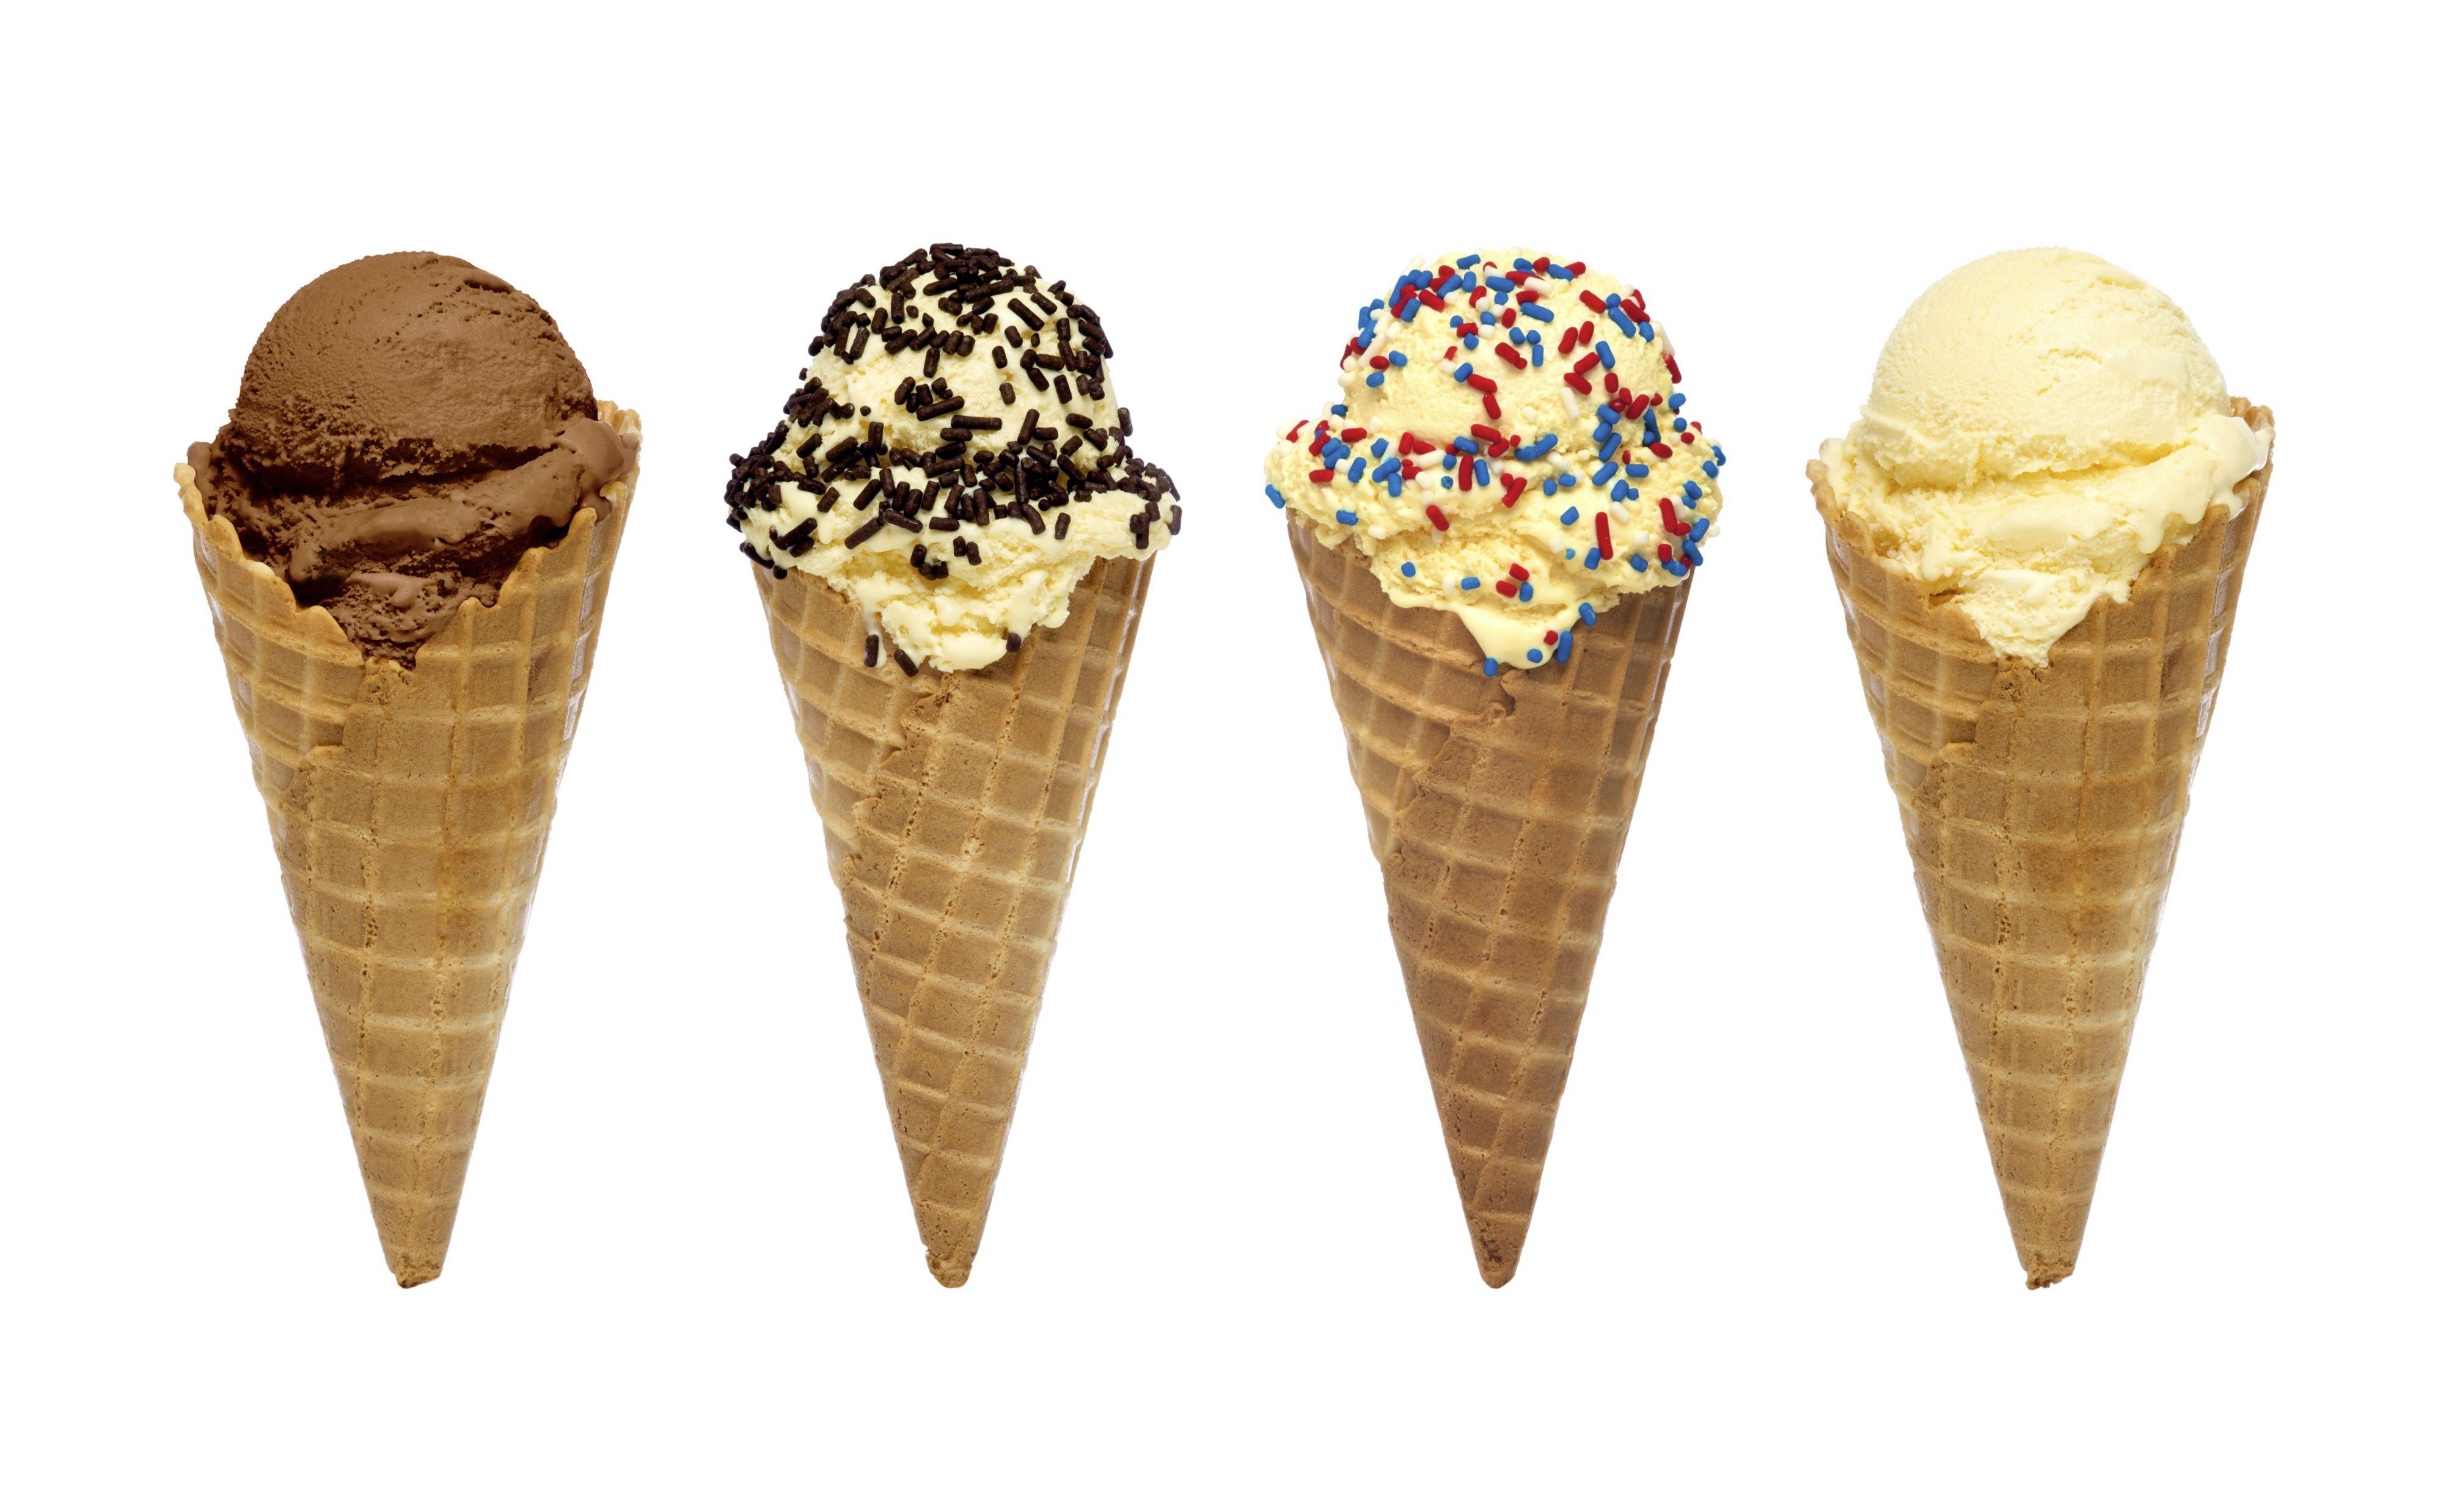 Best Ice Cream & Gelato in the Washington, DC Area